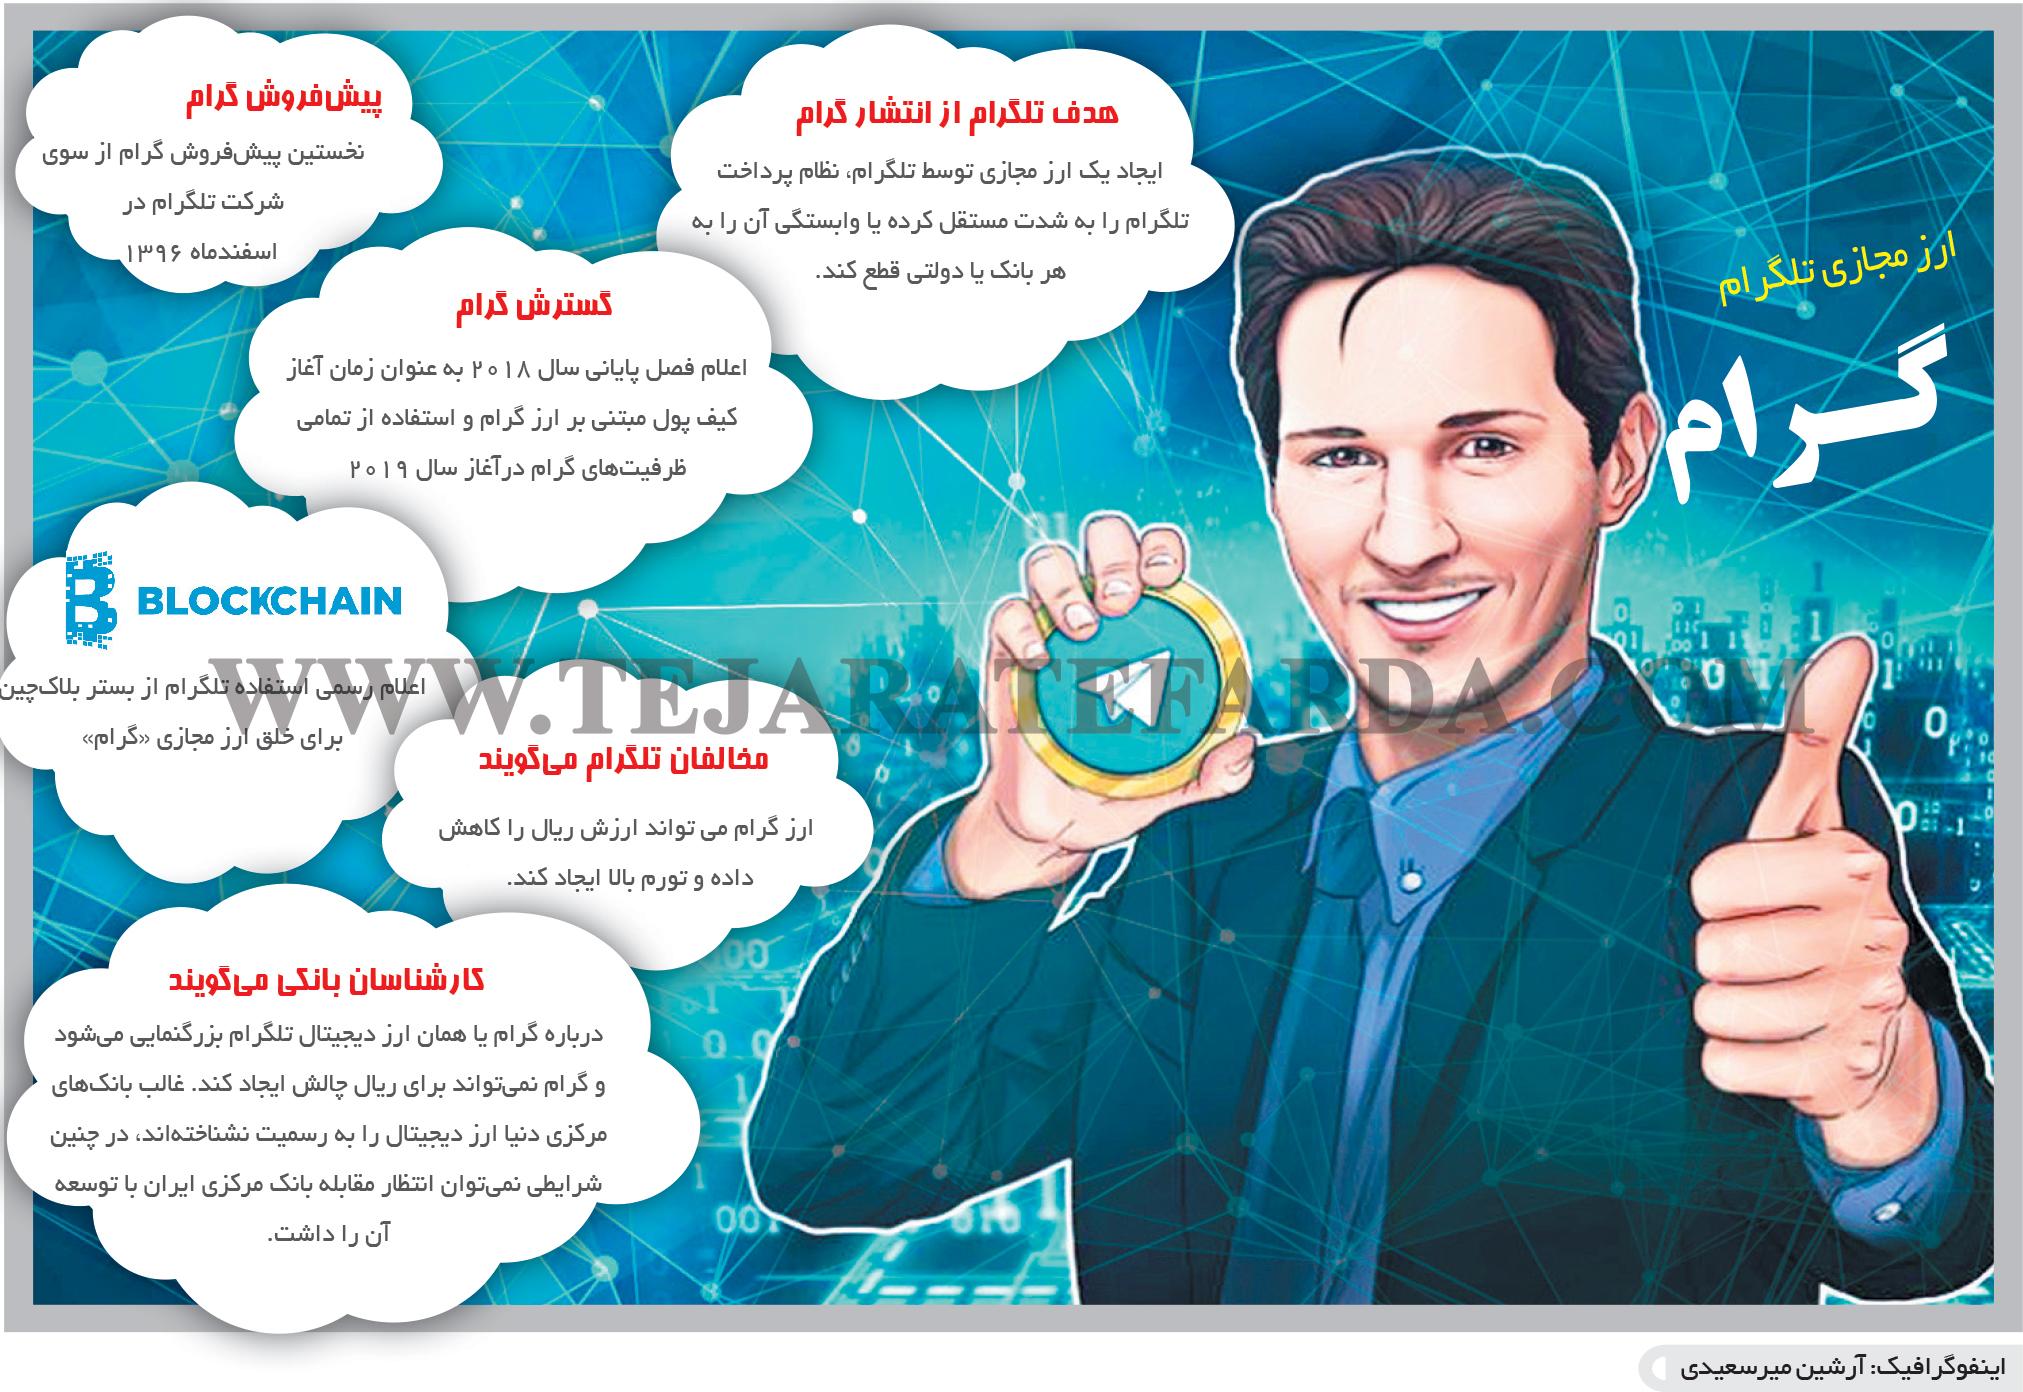 تجارت- فردا- گرام و تلگرام(اینفوگرافیک)